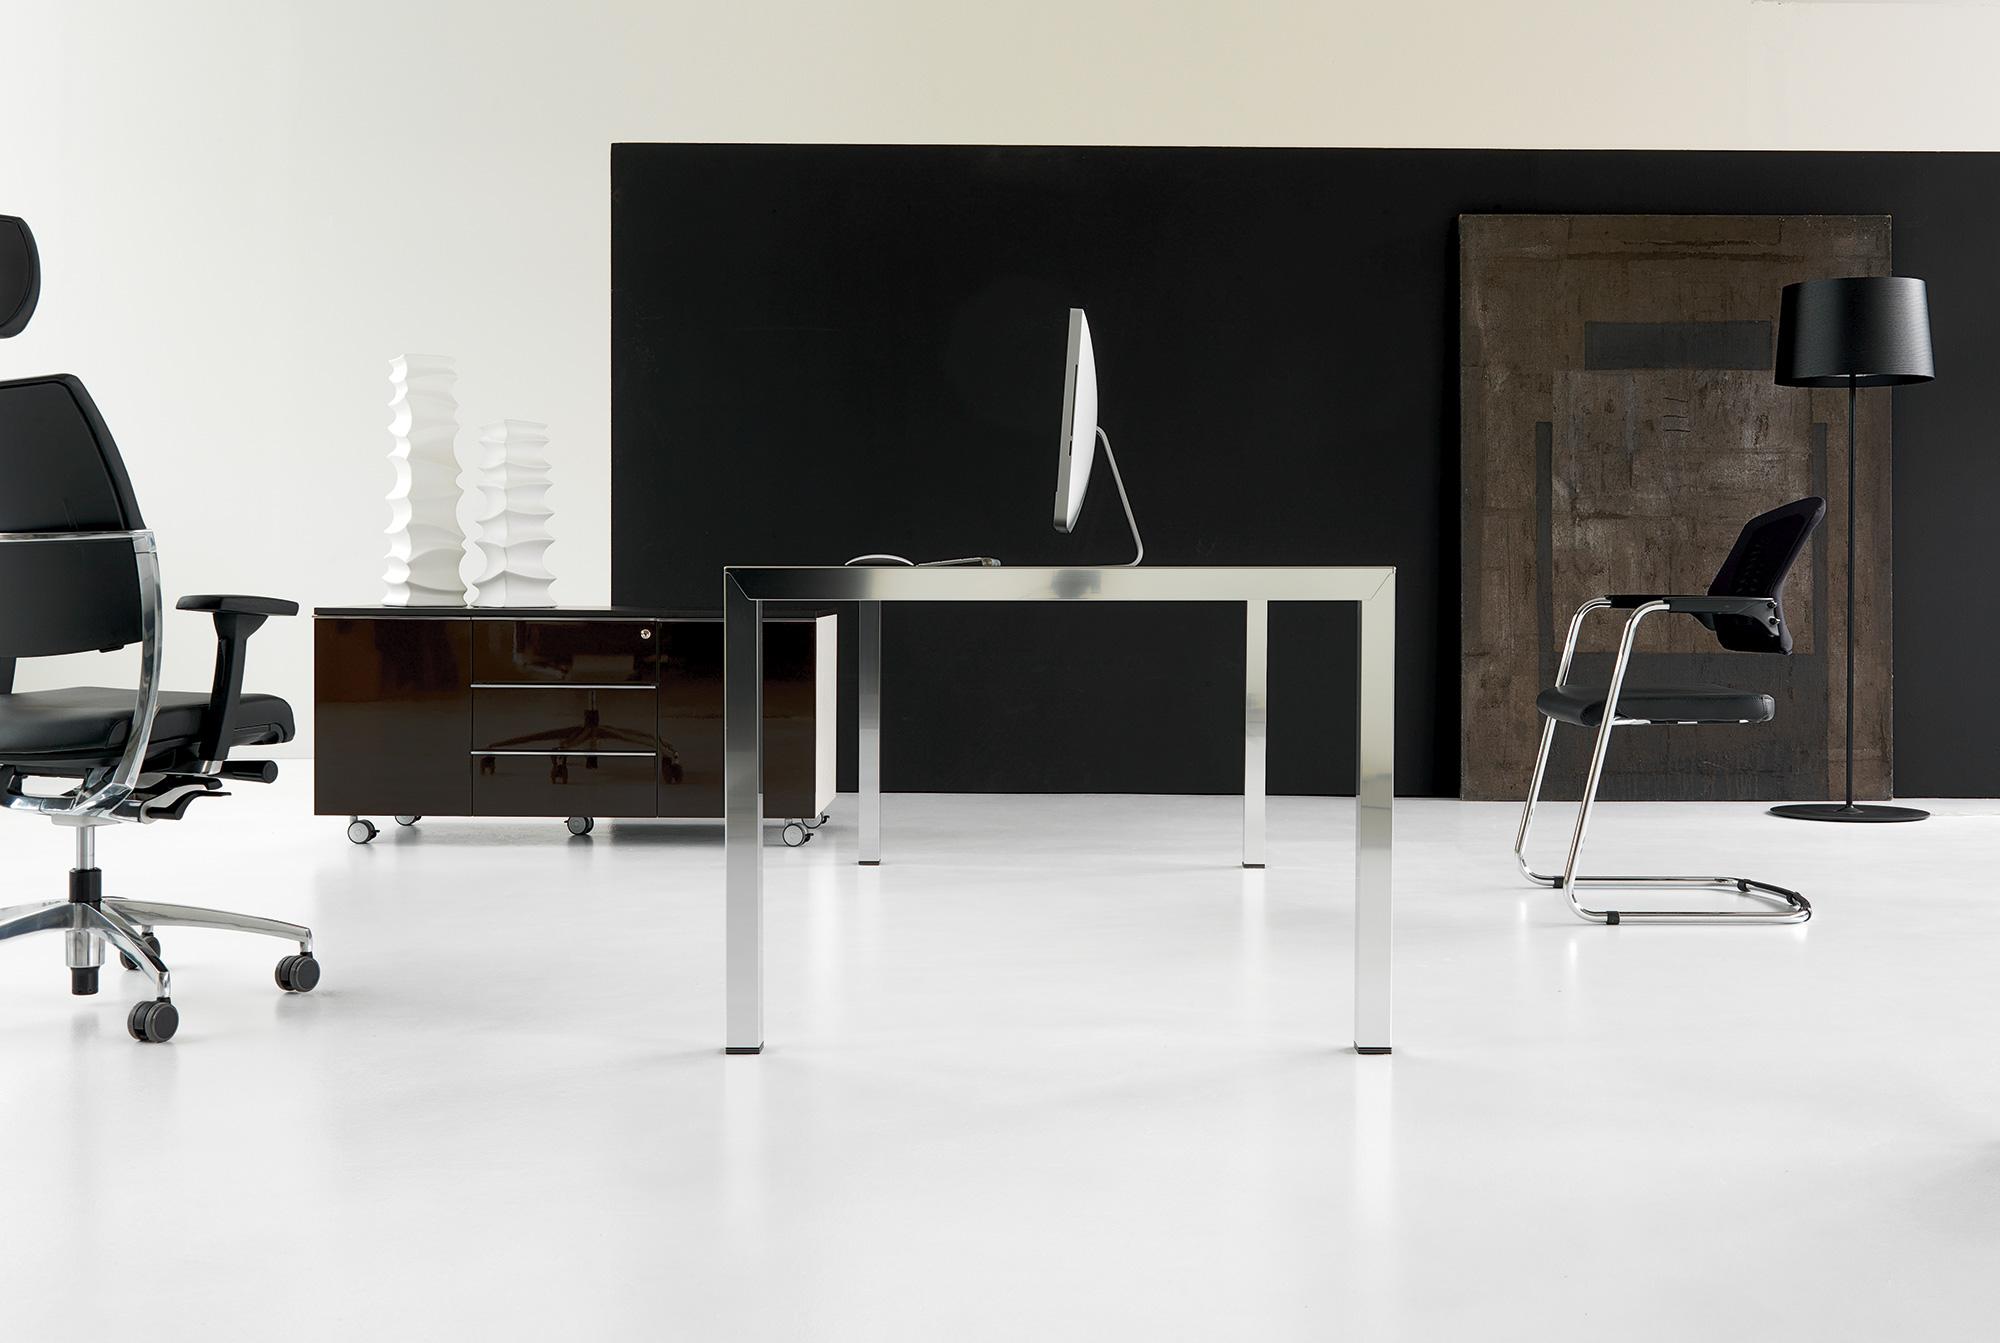 Prezentare produs mobilier pentru birouri fly 1 ivm for Mobilier fly